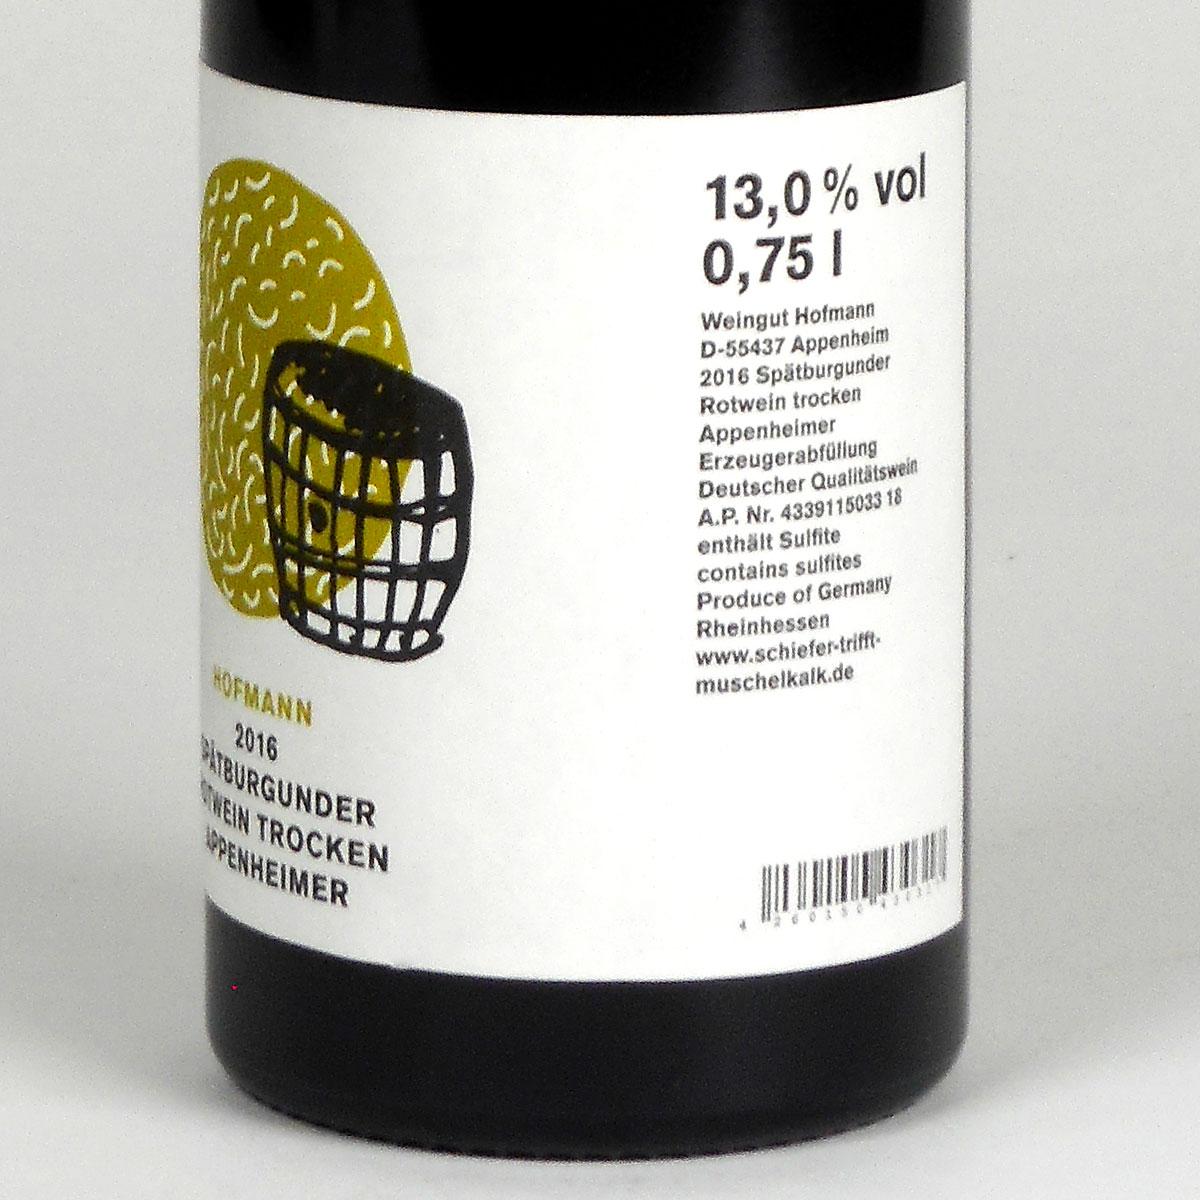 Rheinhessen: Jürgen Hofmann Appenheimer Spätburgunder 2016 - Bottle Rear Label